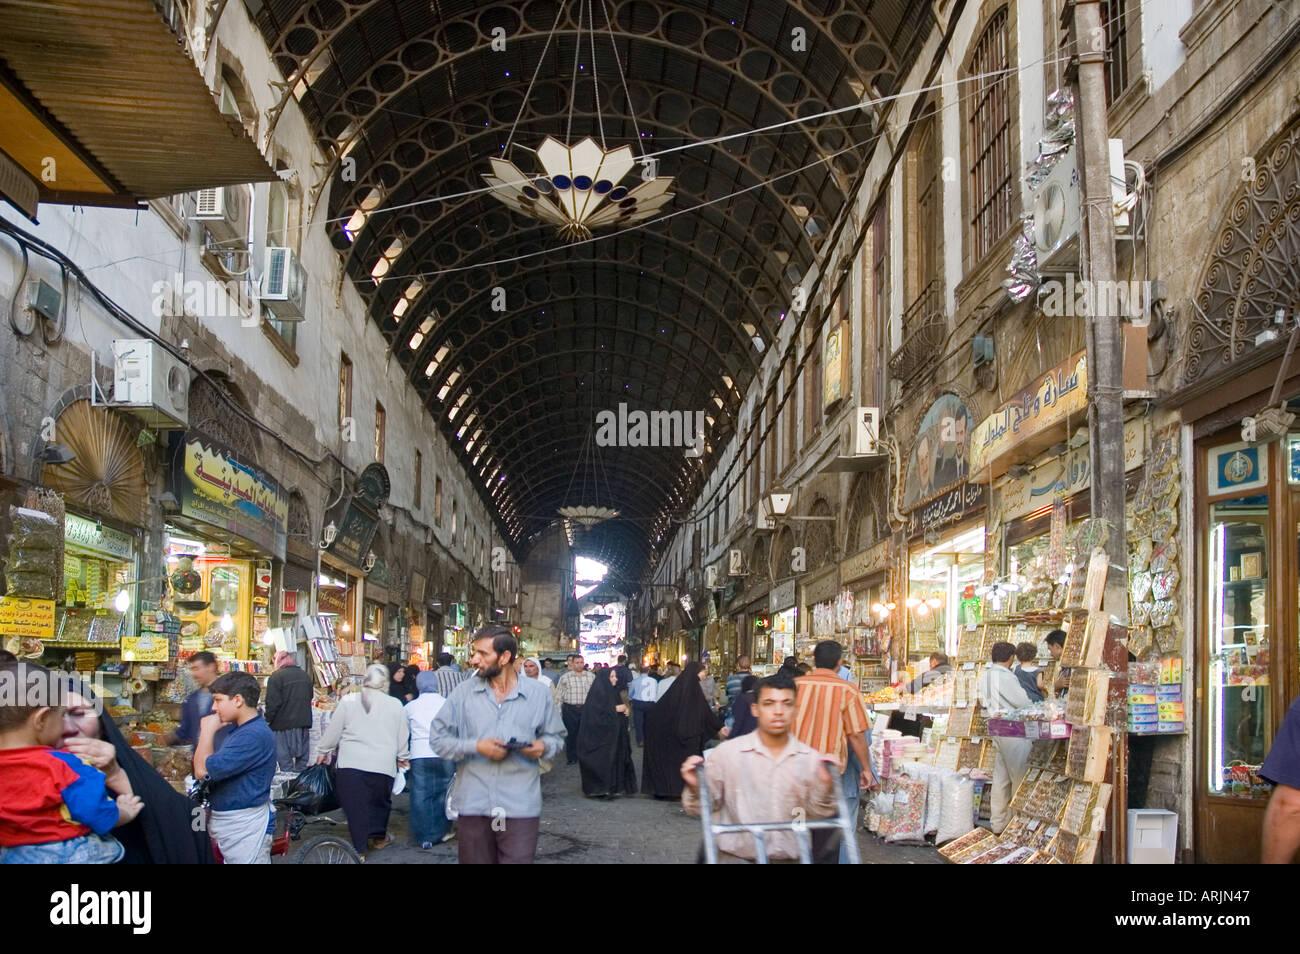 Main street of covered bazaar, al-Hamidiyya souk, souq, district of Damascus, Syria, Middle East. DSC 5703 Stock Photo